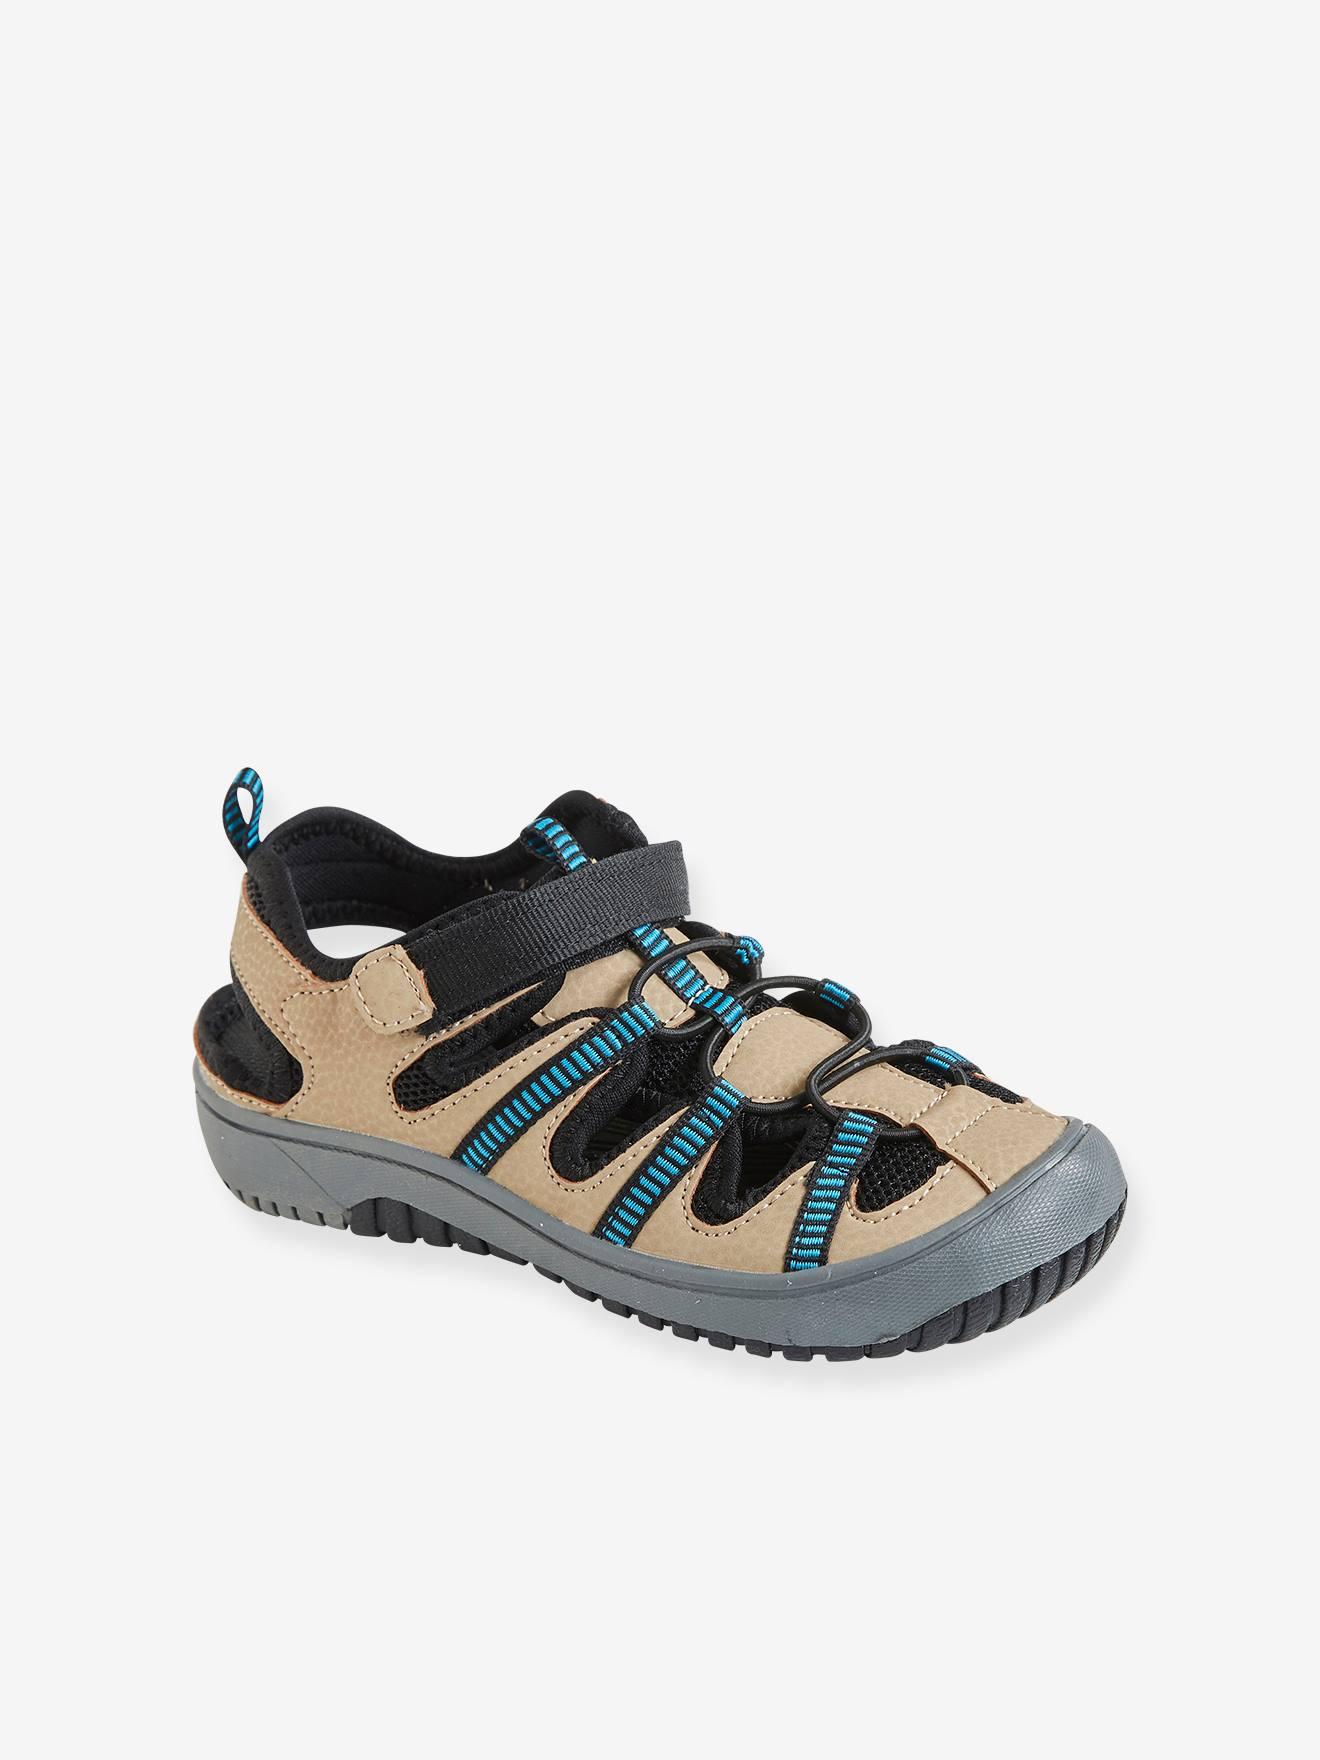 Sandales tout terrain garçon taupe